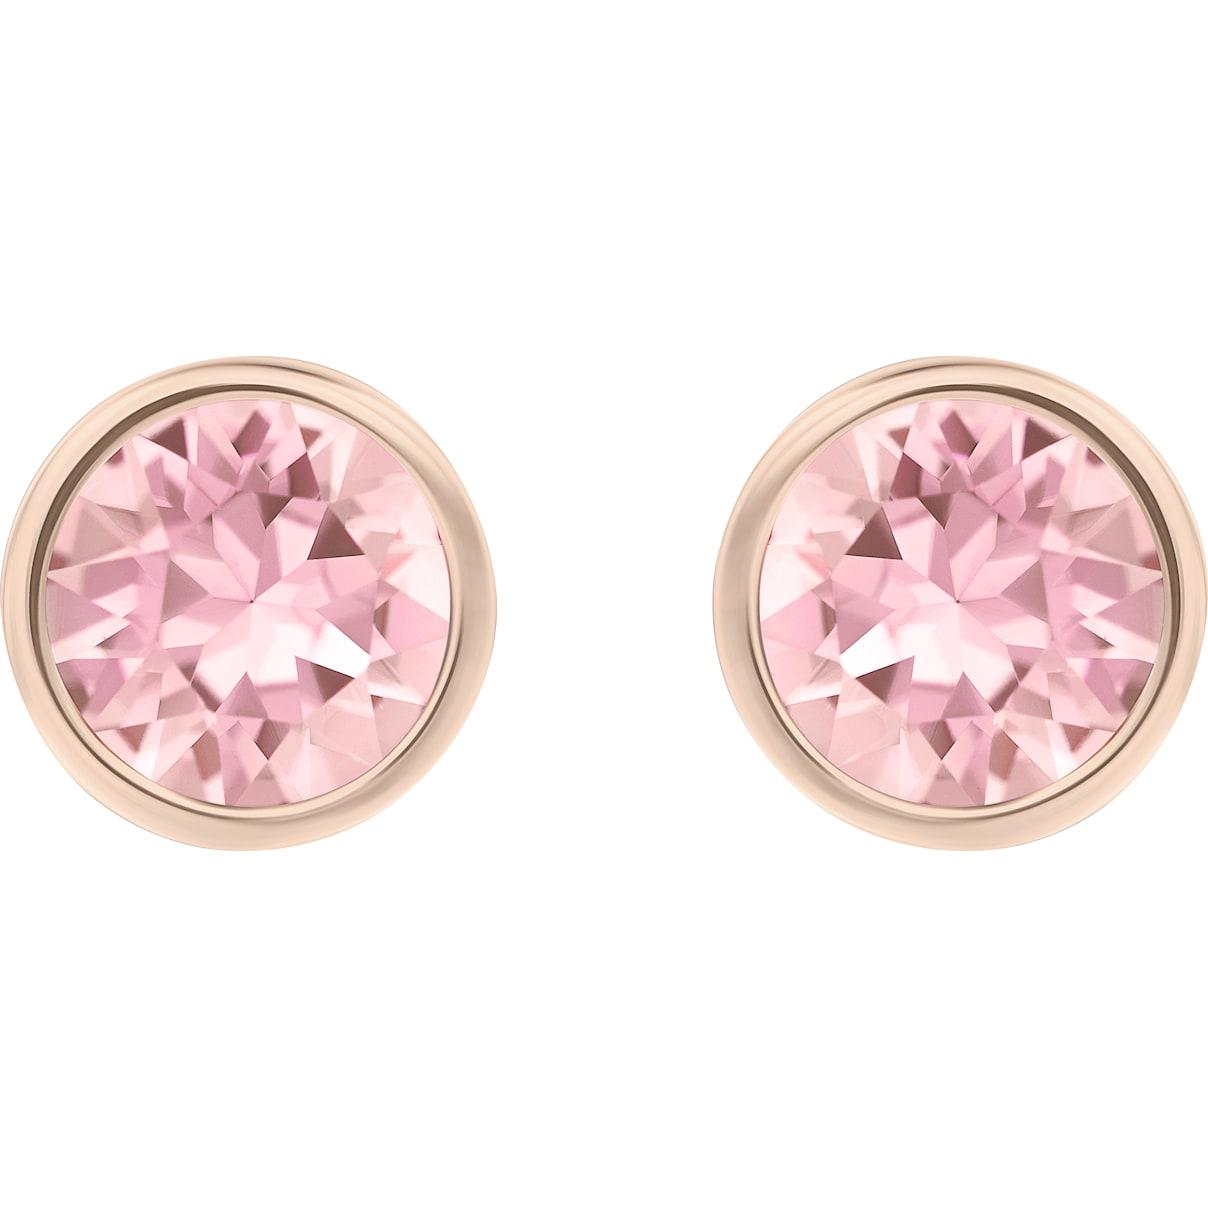 Swarovski Solitaire Pierced Earrings, Pink, Rhodium plated